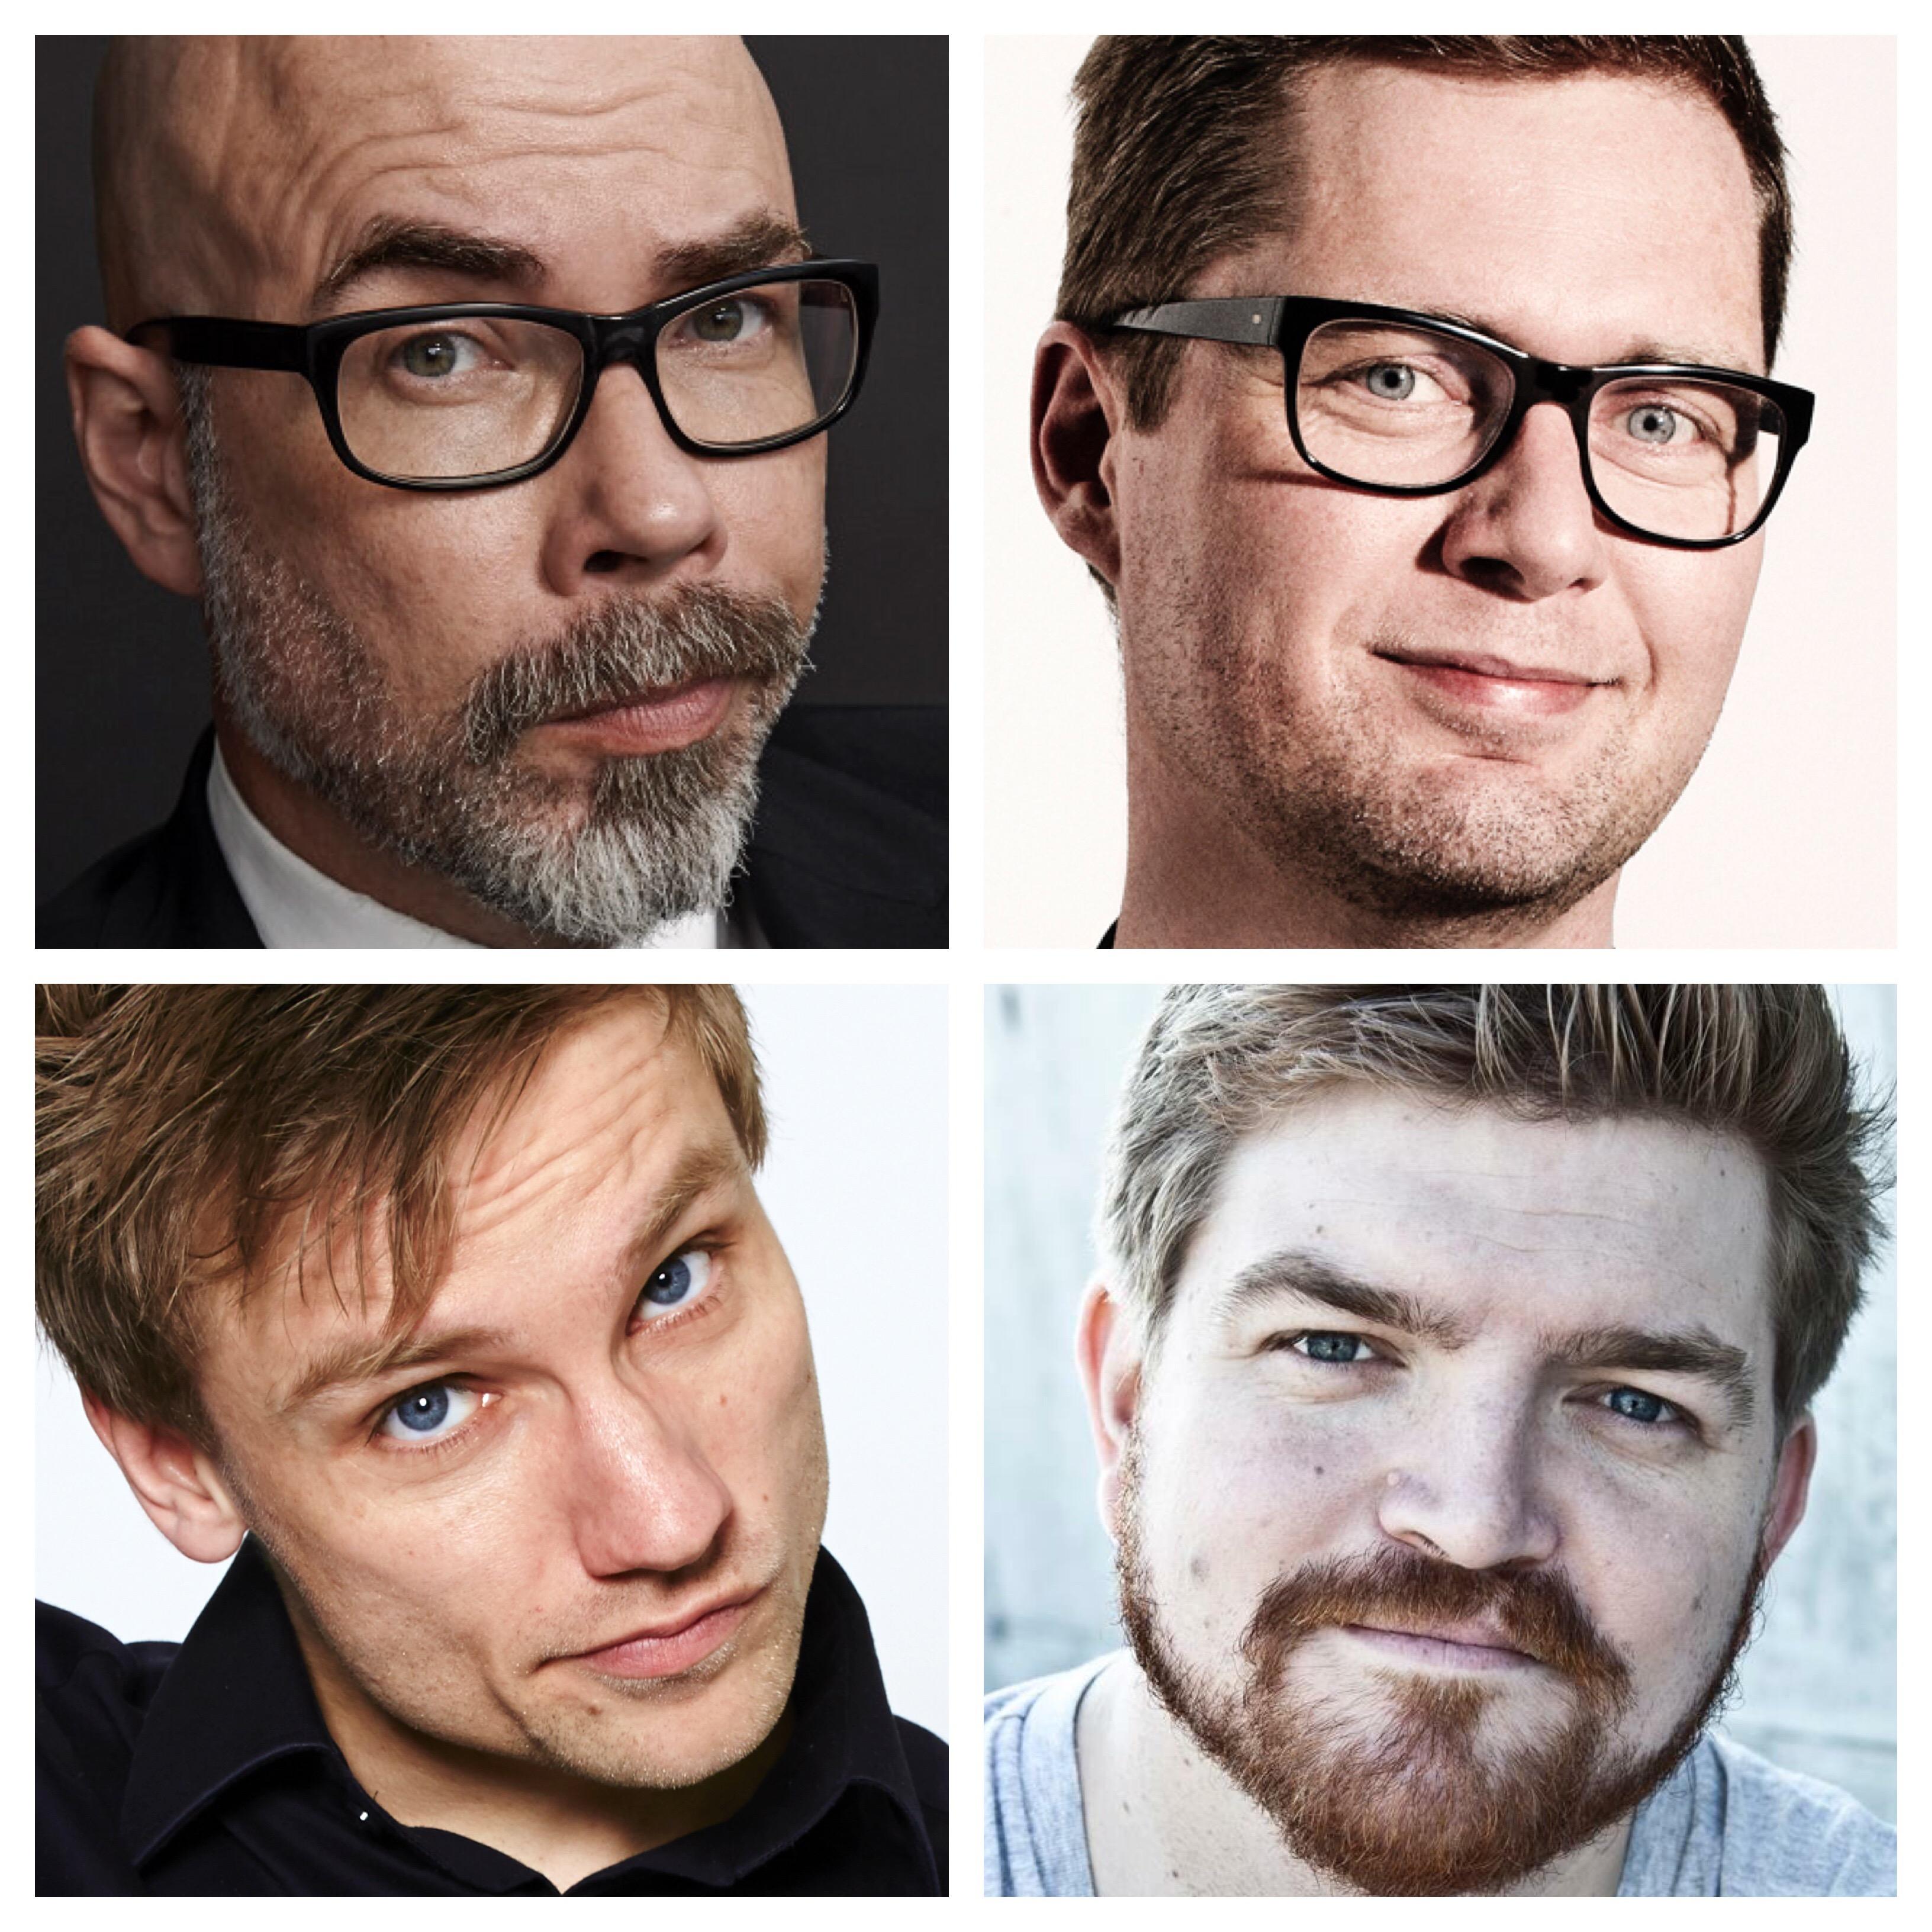 Brian Mørk Show #125: Lasse Rimmer & Jakob Svendsen & Valdemar Pustelnik | Lytbare podcasts